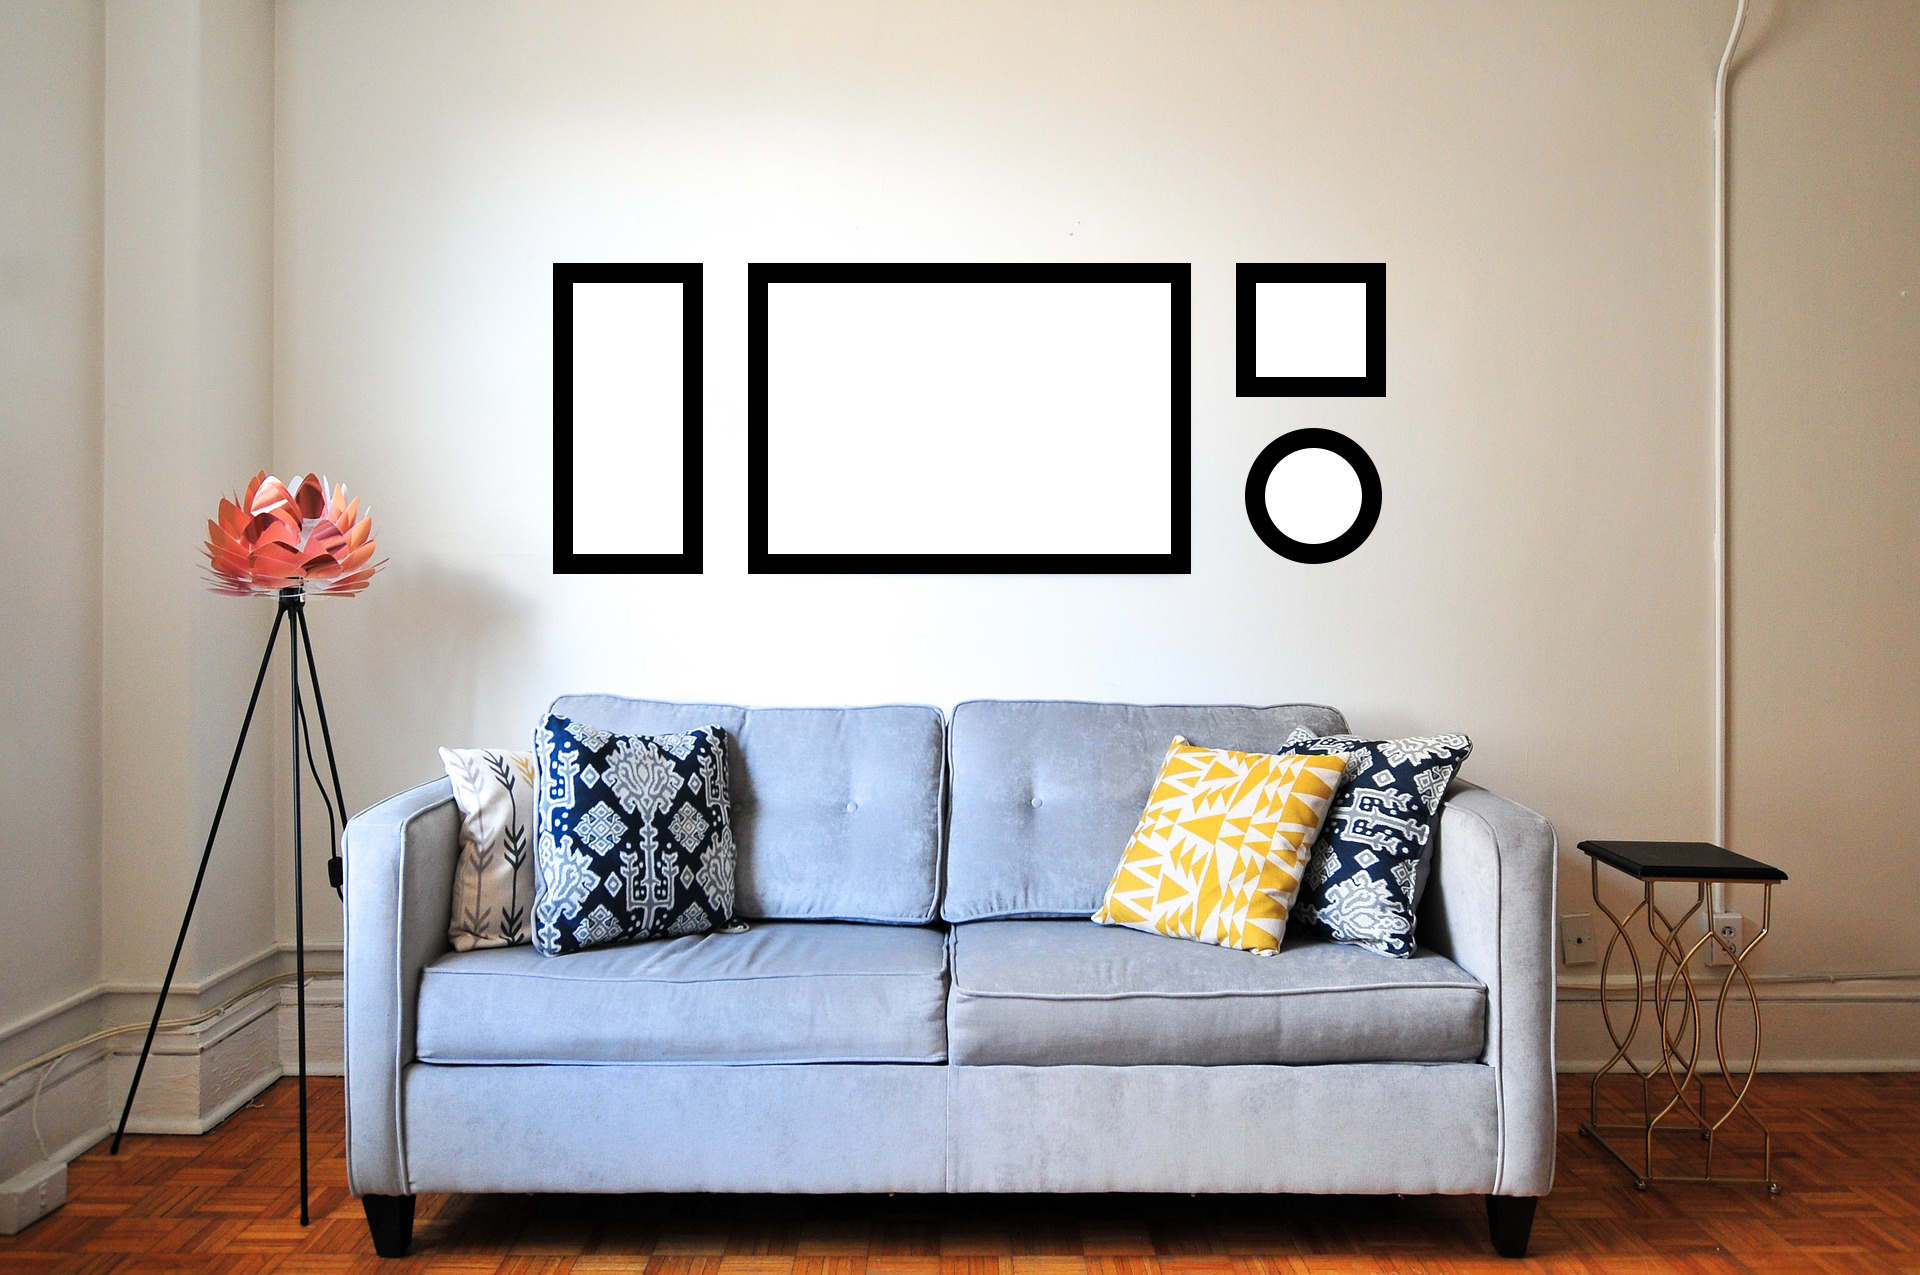 Couch Multi.jpg